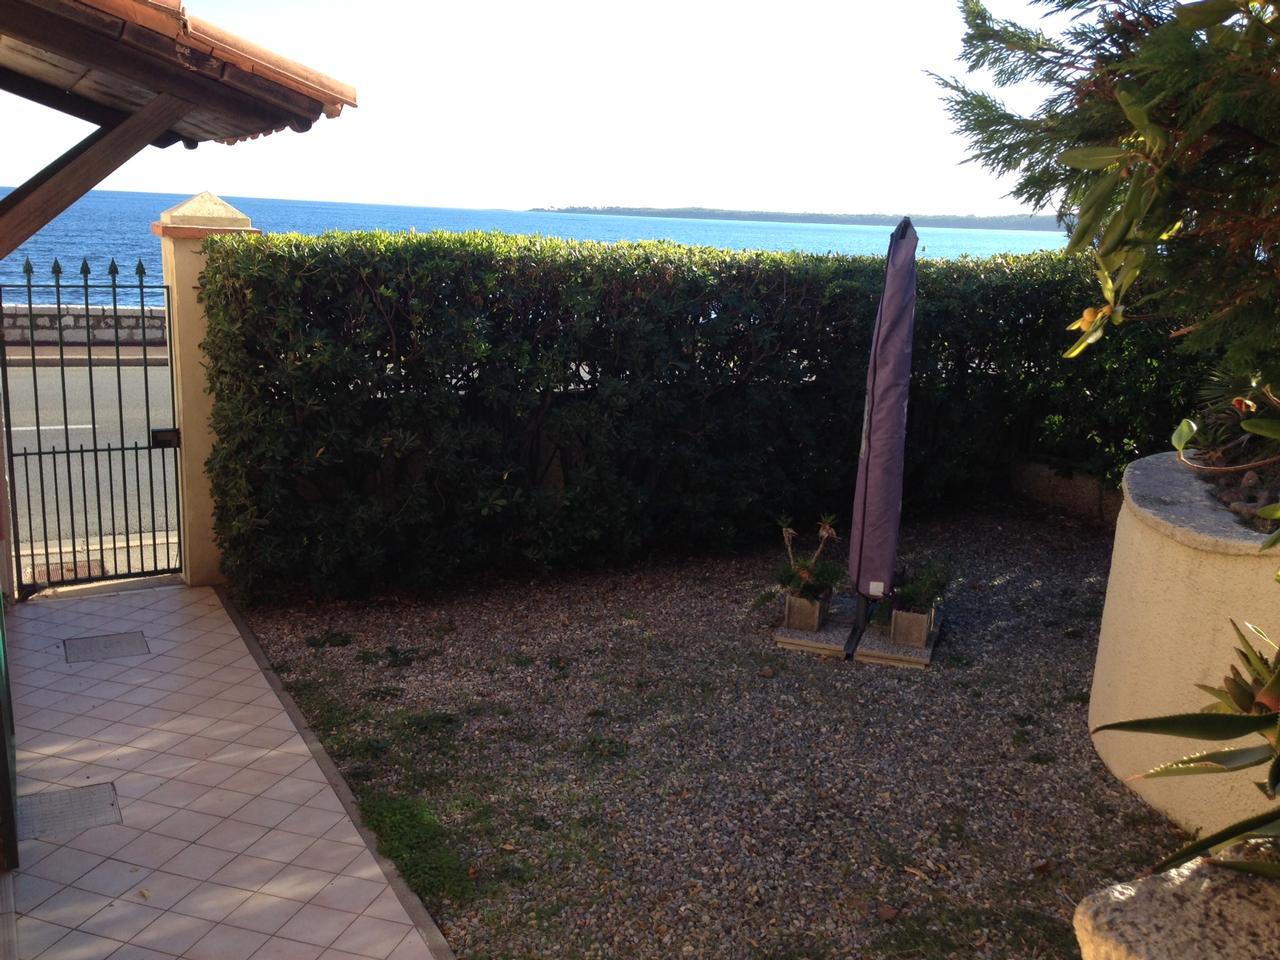 Immobilier nice vue mer appartement cannes palm beach for Appartement rez de jardin nice